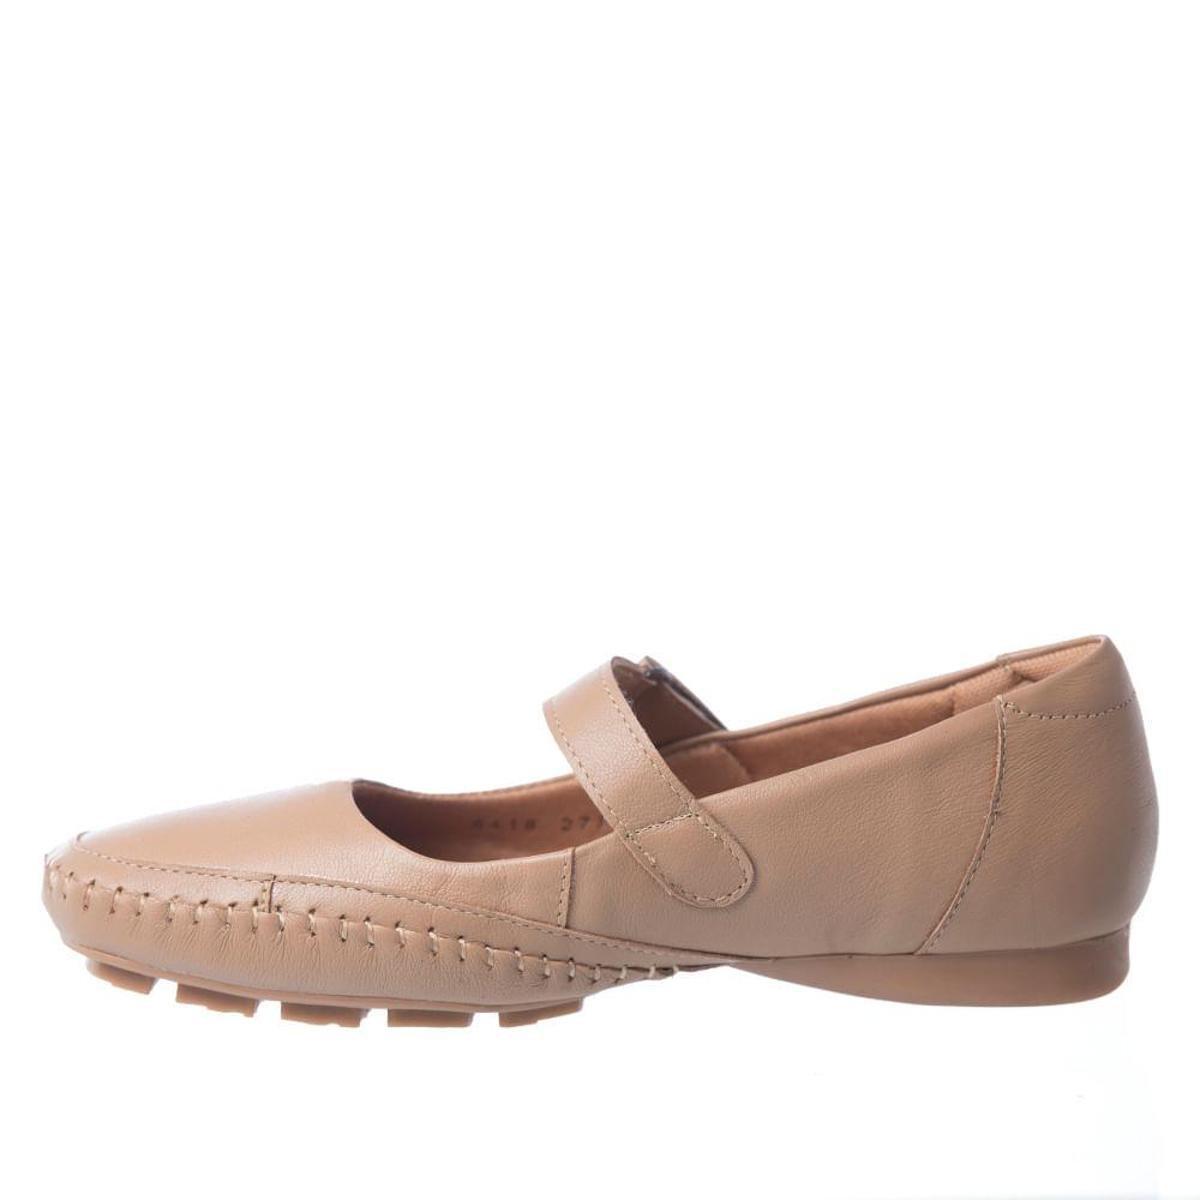 Sapatilha Couro Doctor Shoes Feminina - Bege